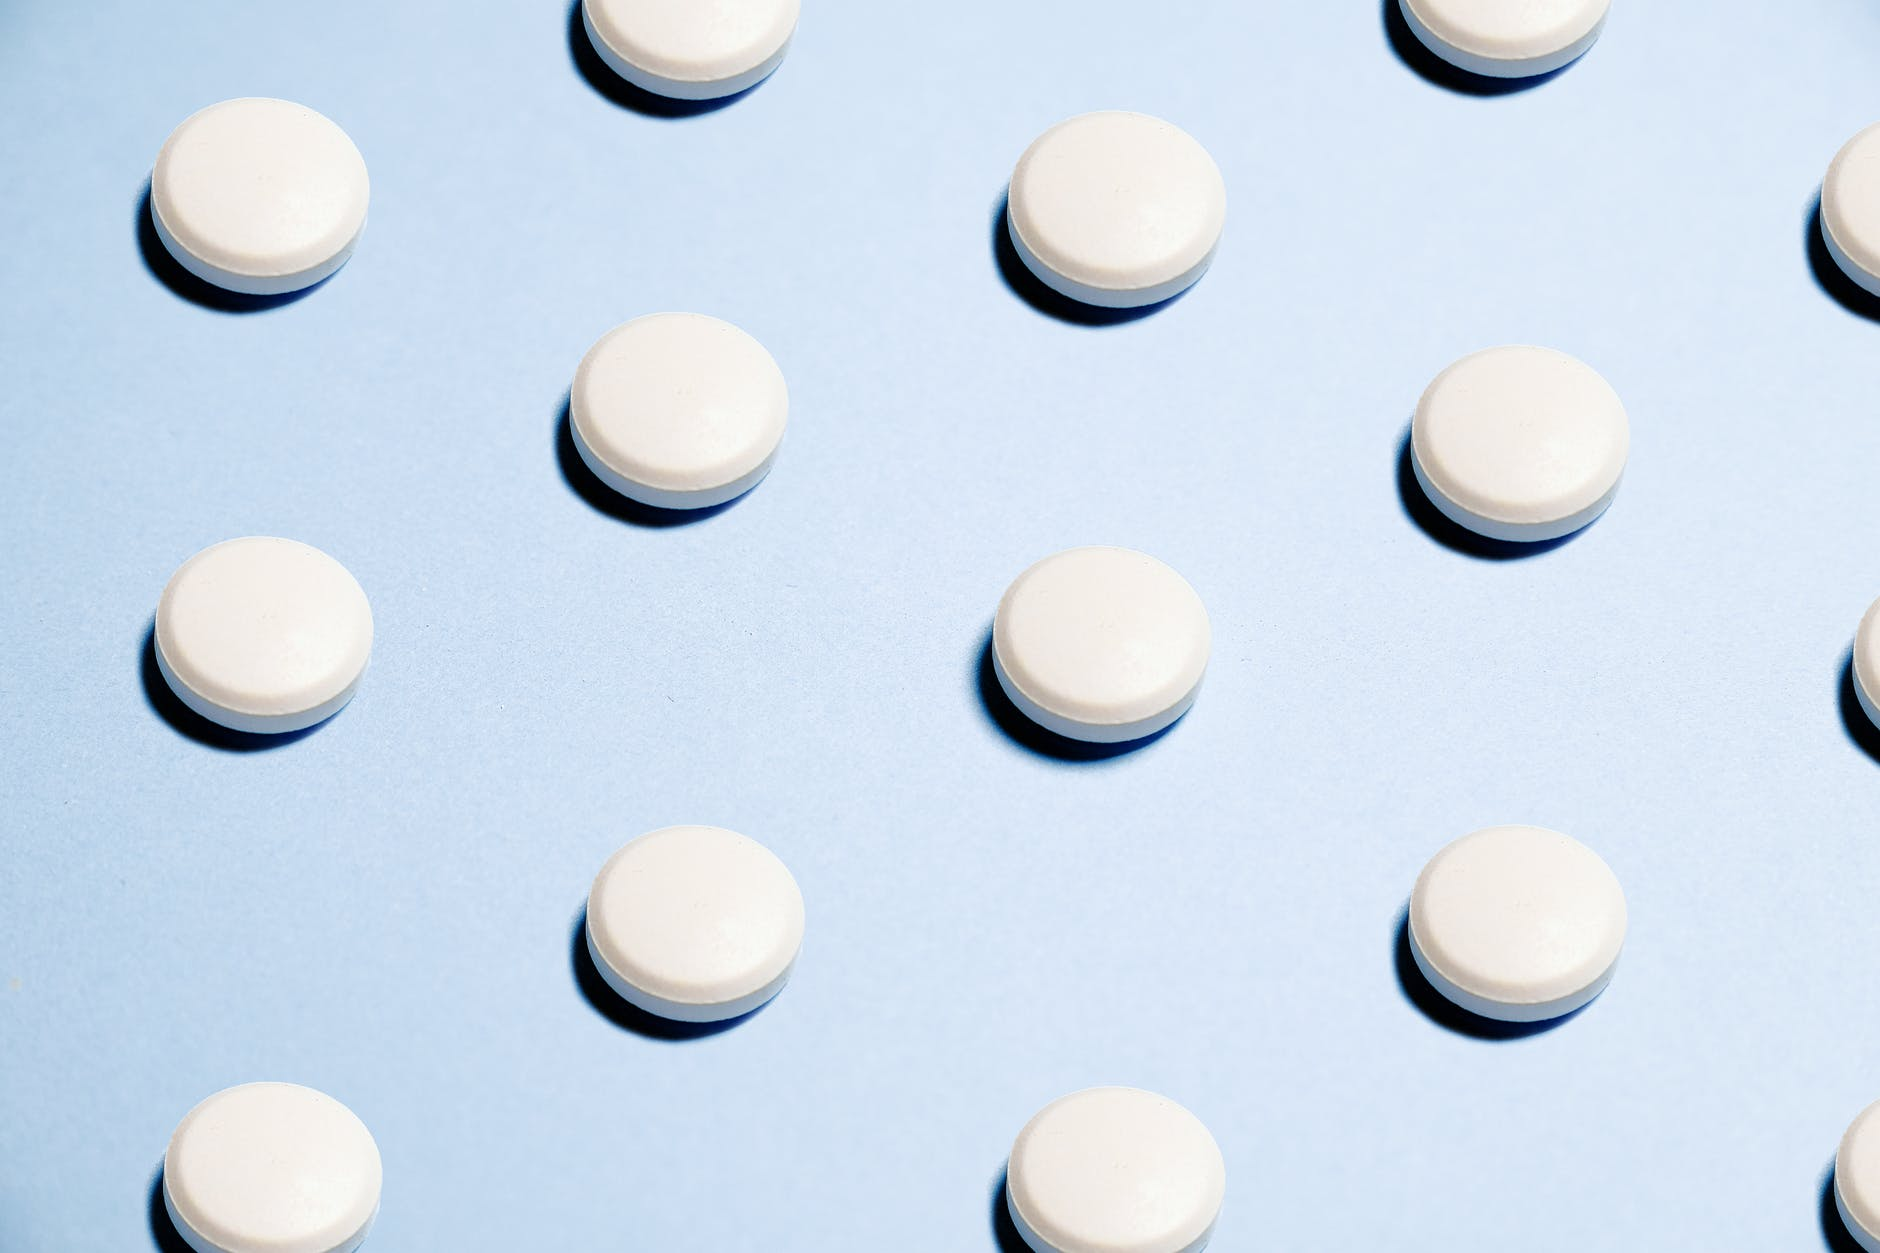 white round capsules